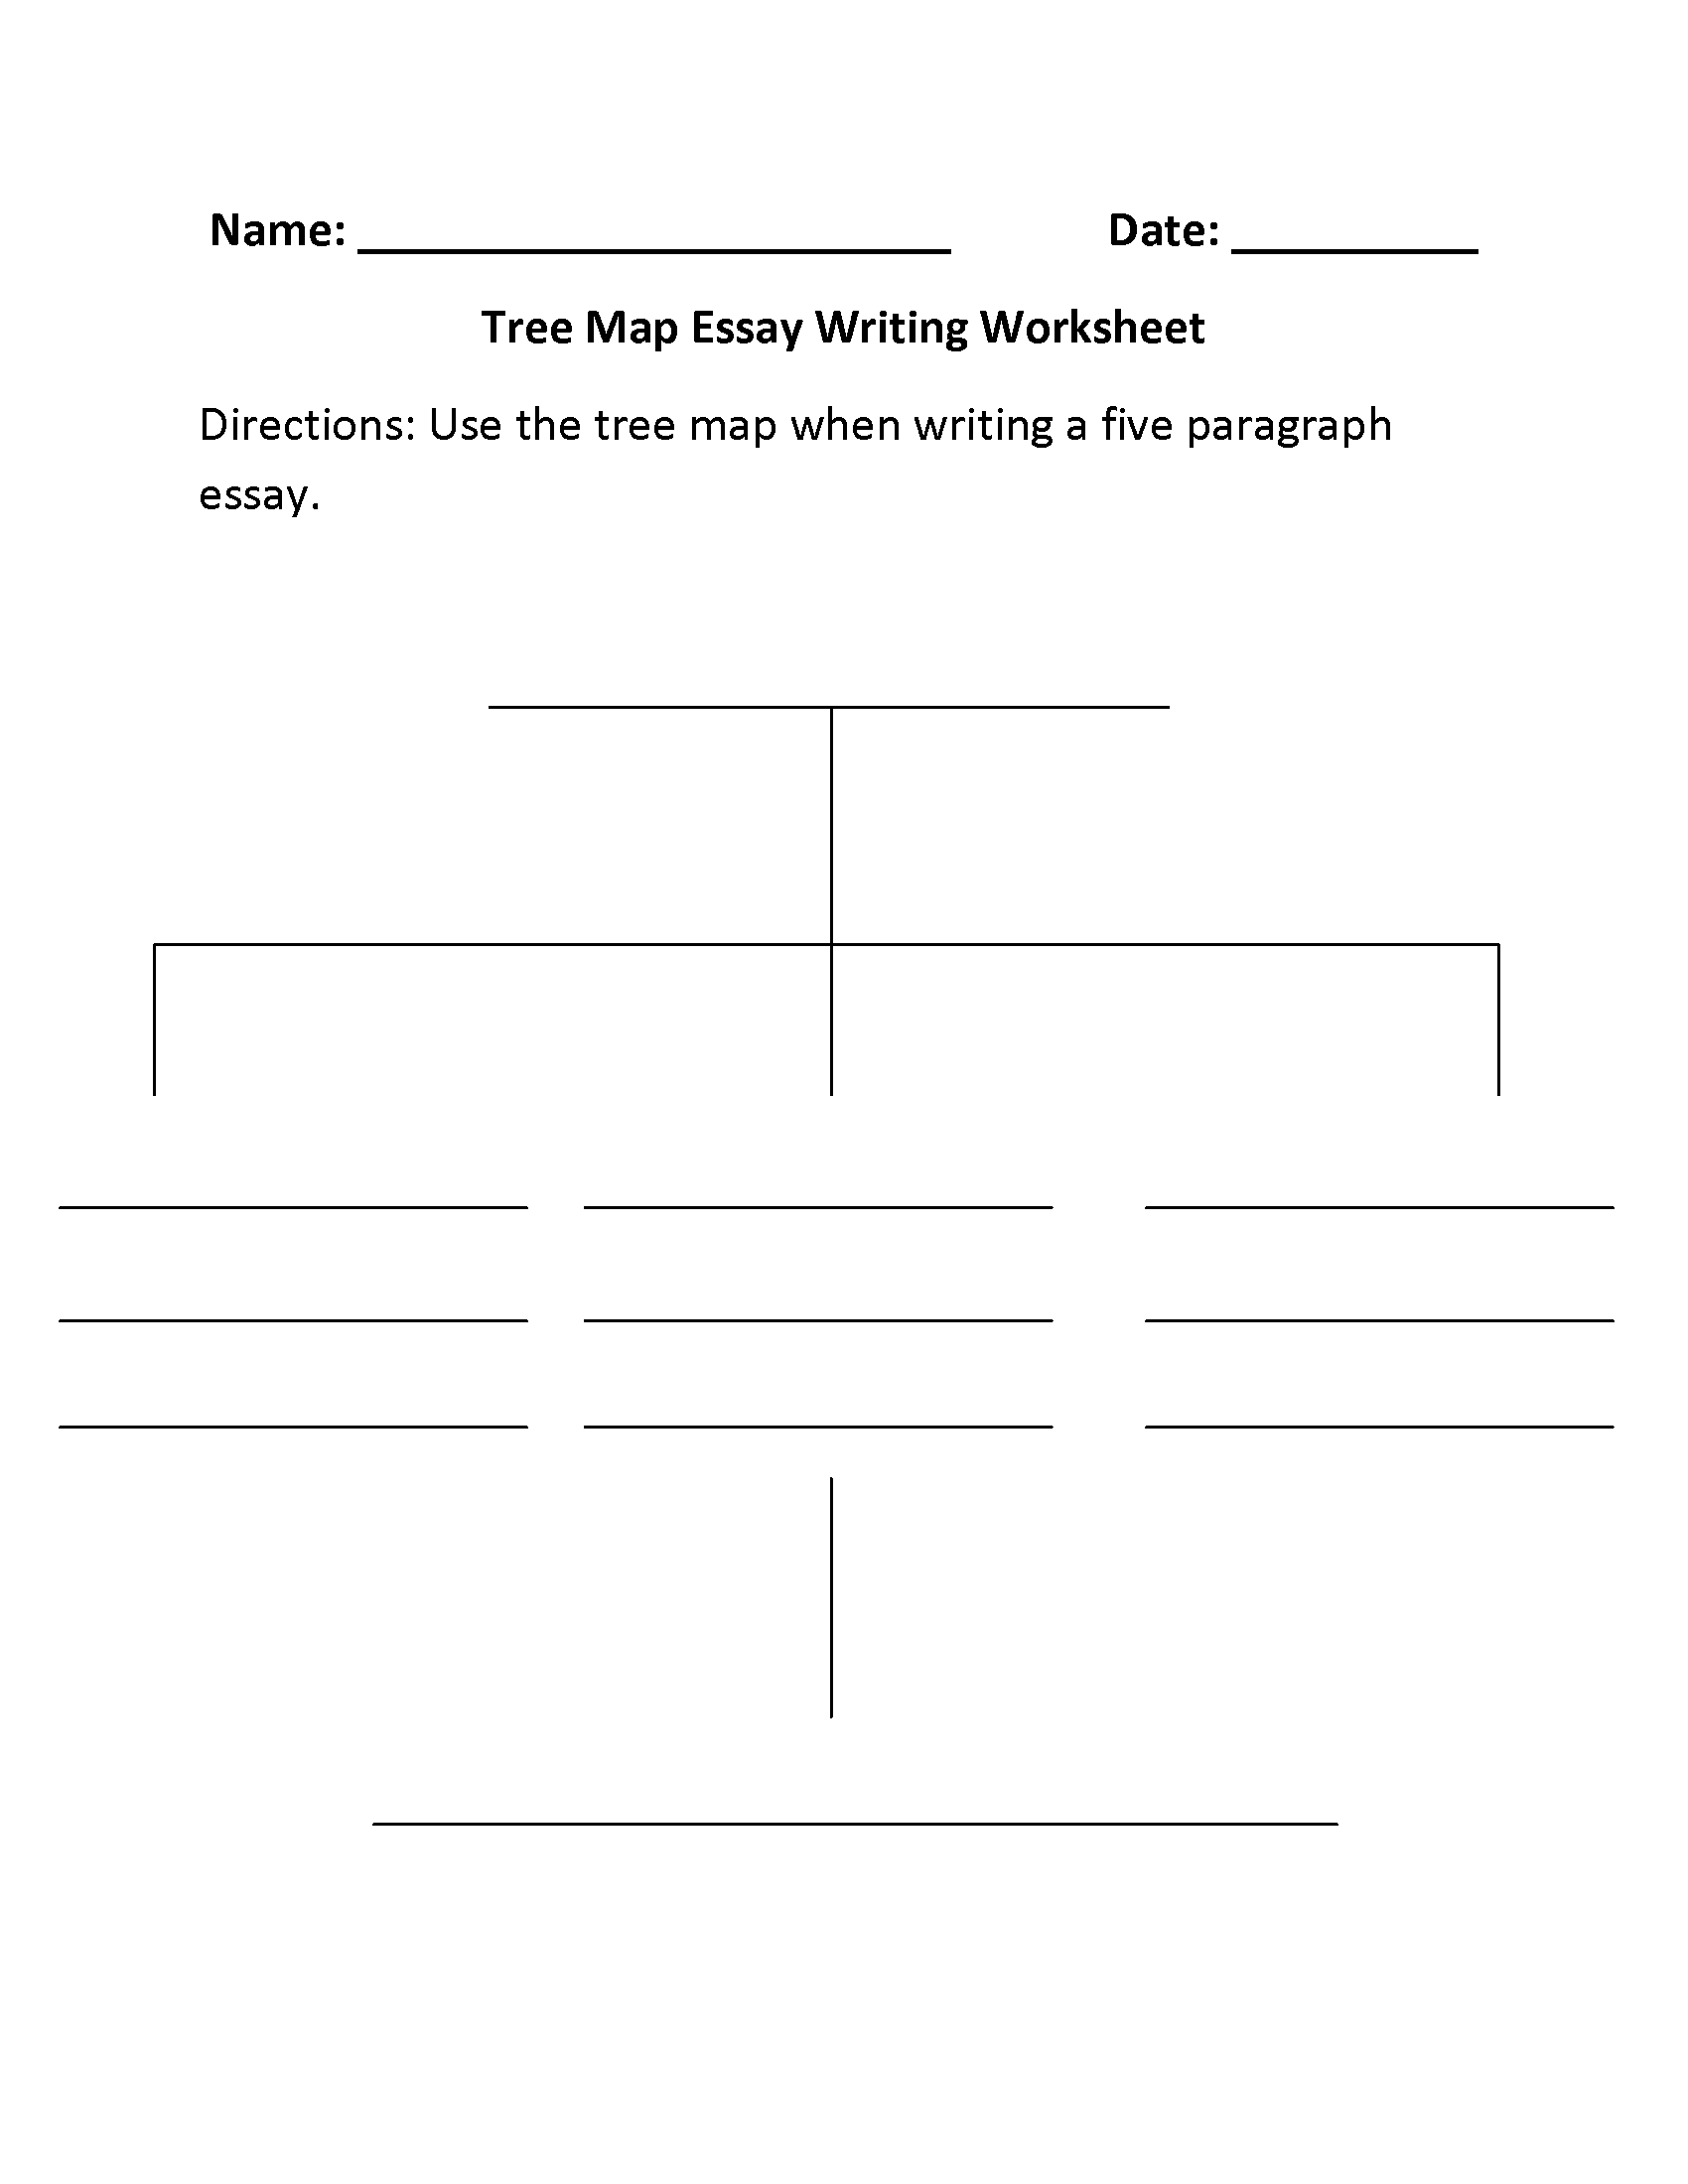 Tree Map Essay Writing Worksheets Essay Writing Reading Comprehension Worksheets Writing Worksheets [ 2200 x 1700 Pixel ]